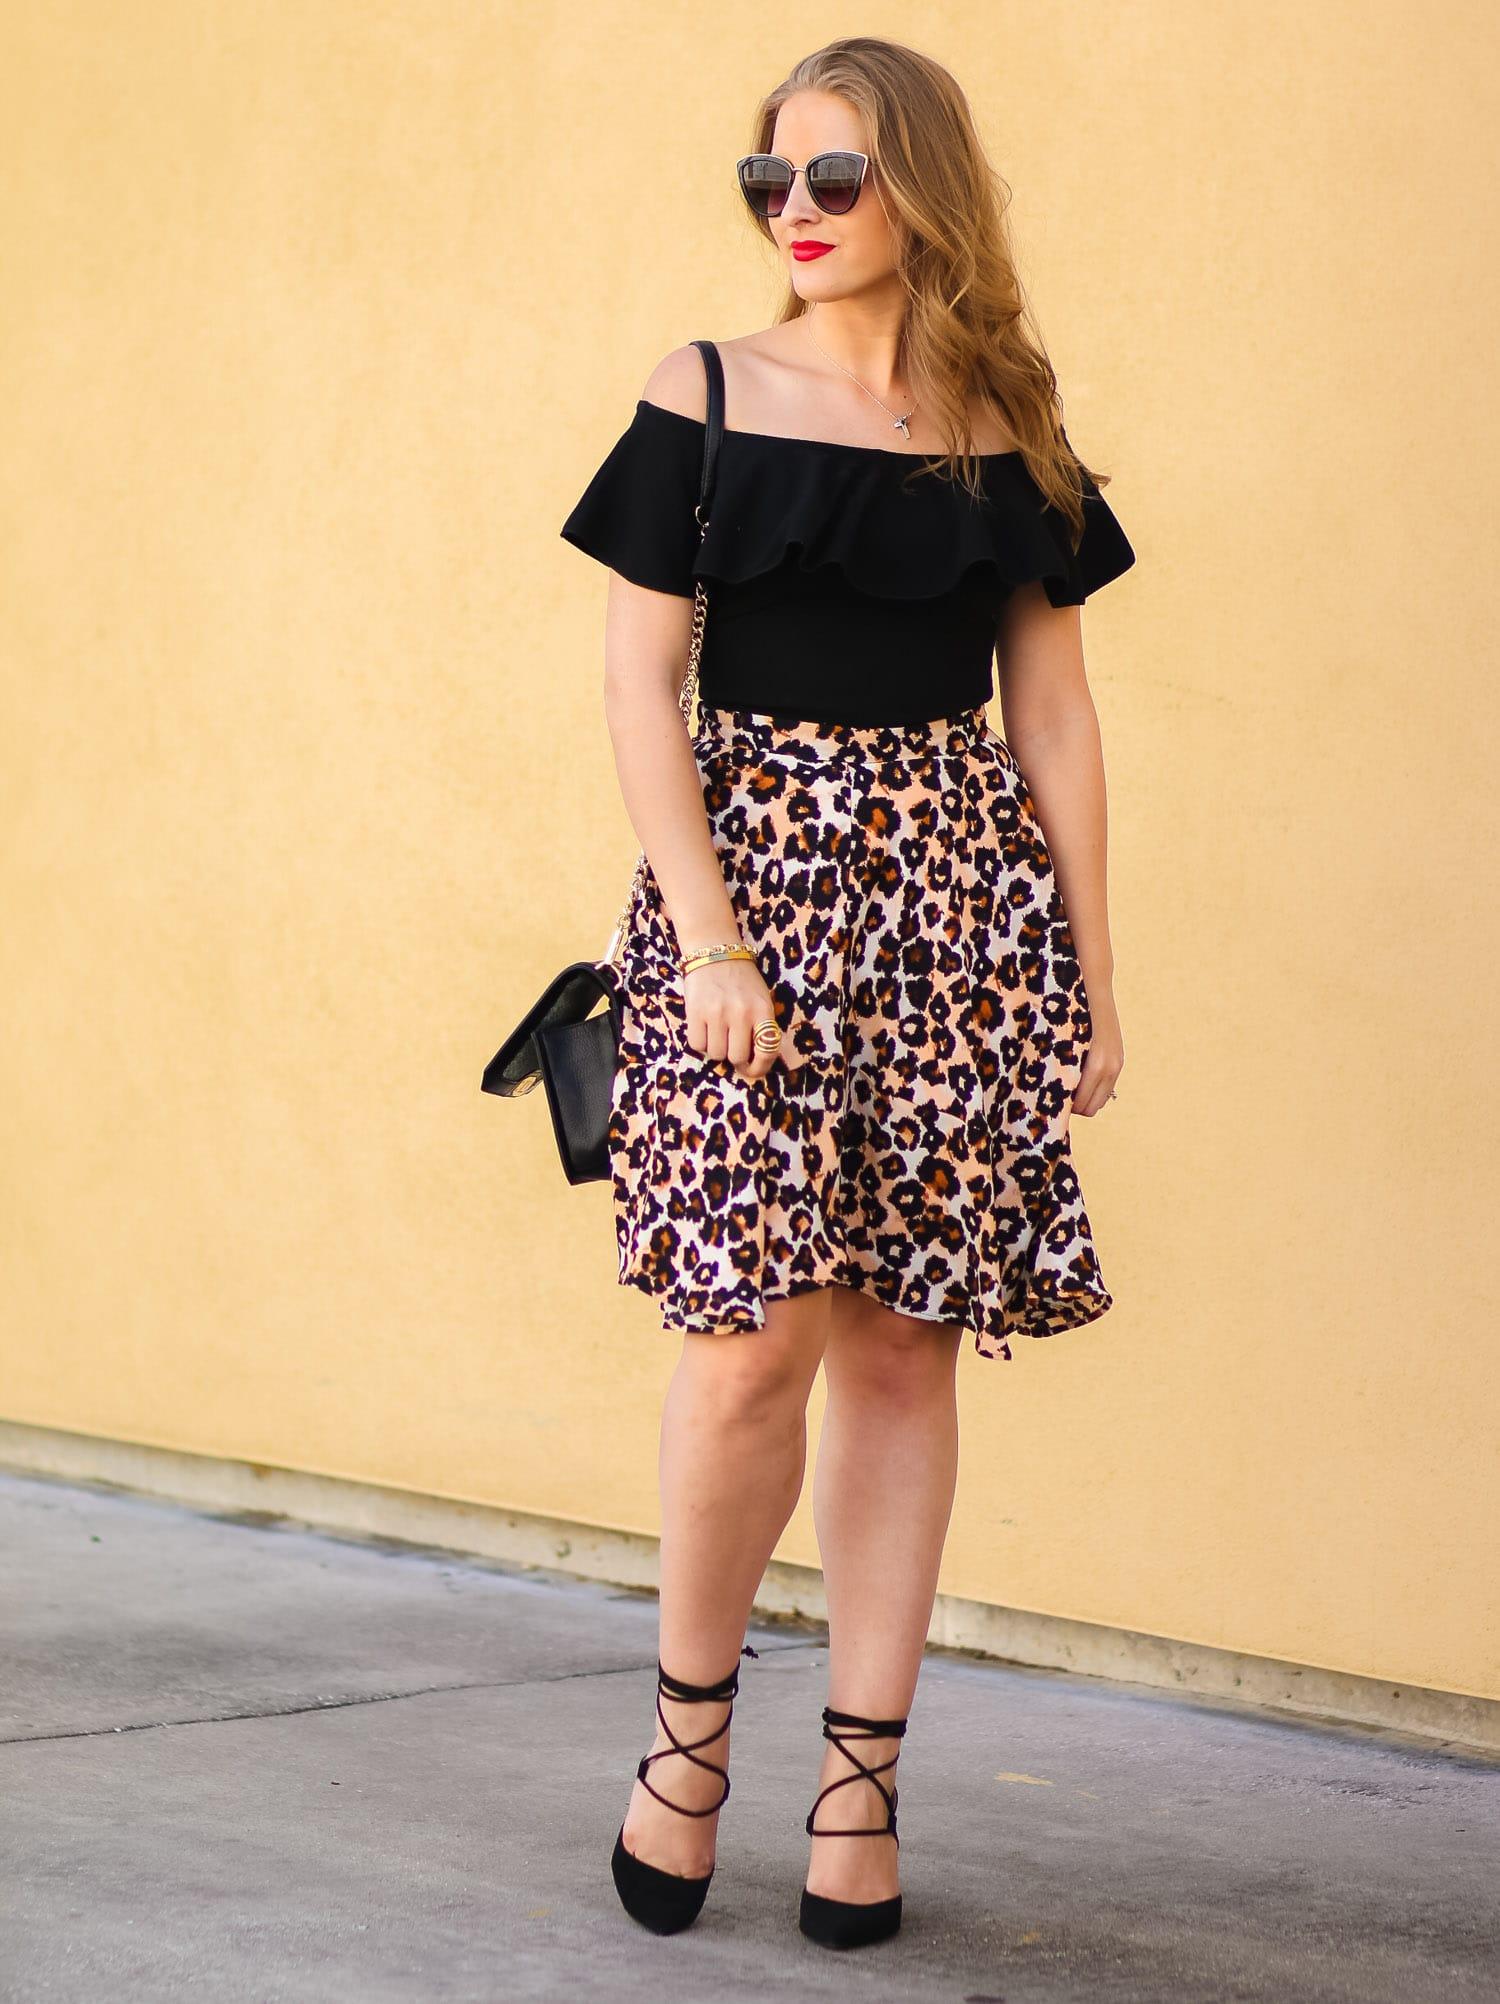 rebecca-minkoff-black-quilted-purse-0939